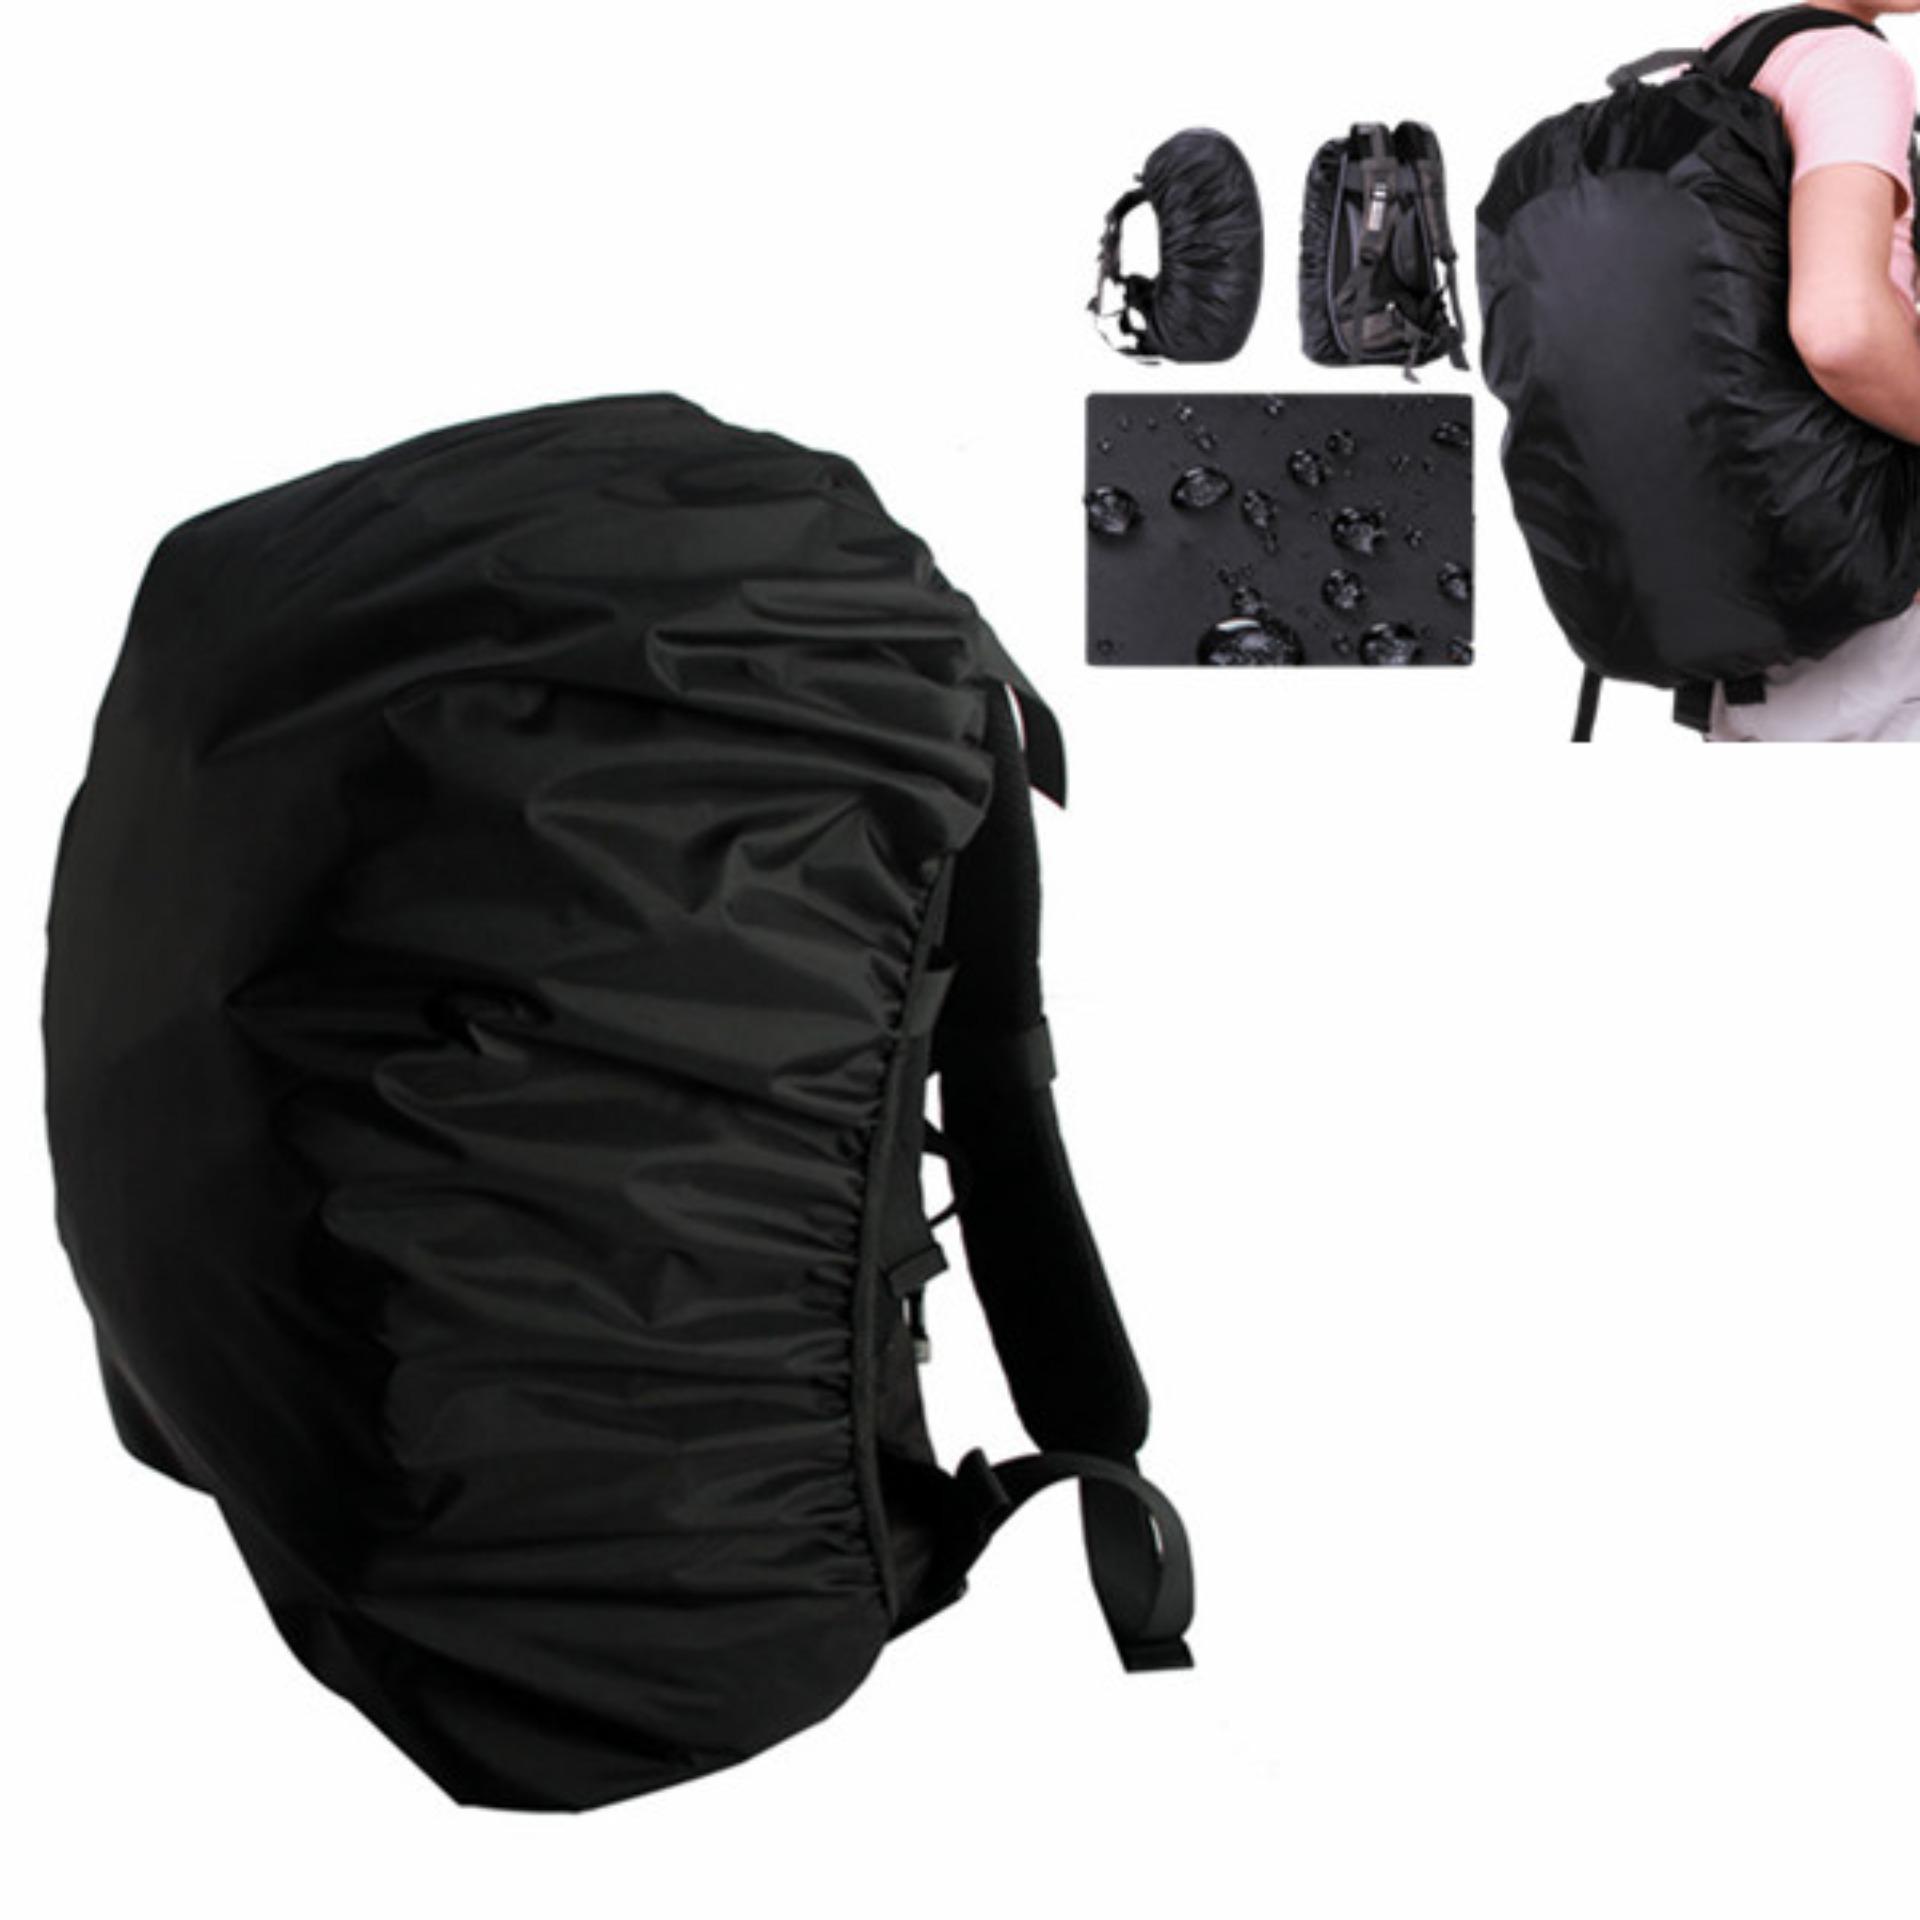 Outdoor Waterproof Backpack Rucksack Rain Cover Bag Rainproof Pack Cover  for Camping Hiking (Black) fb3774474e